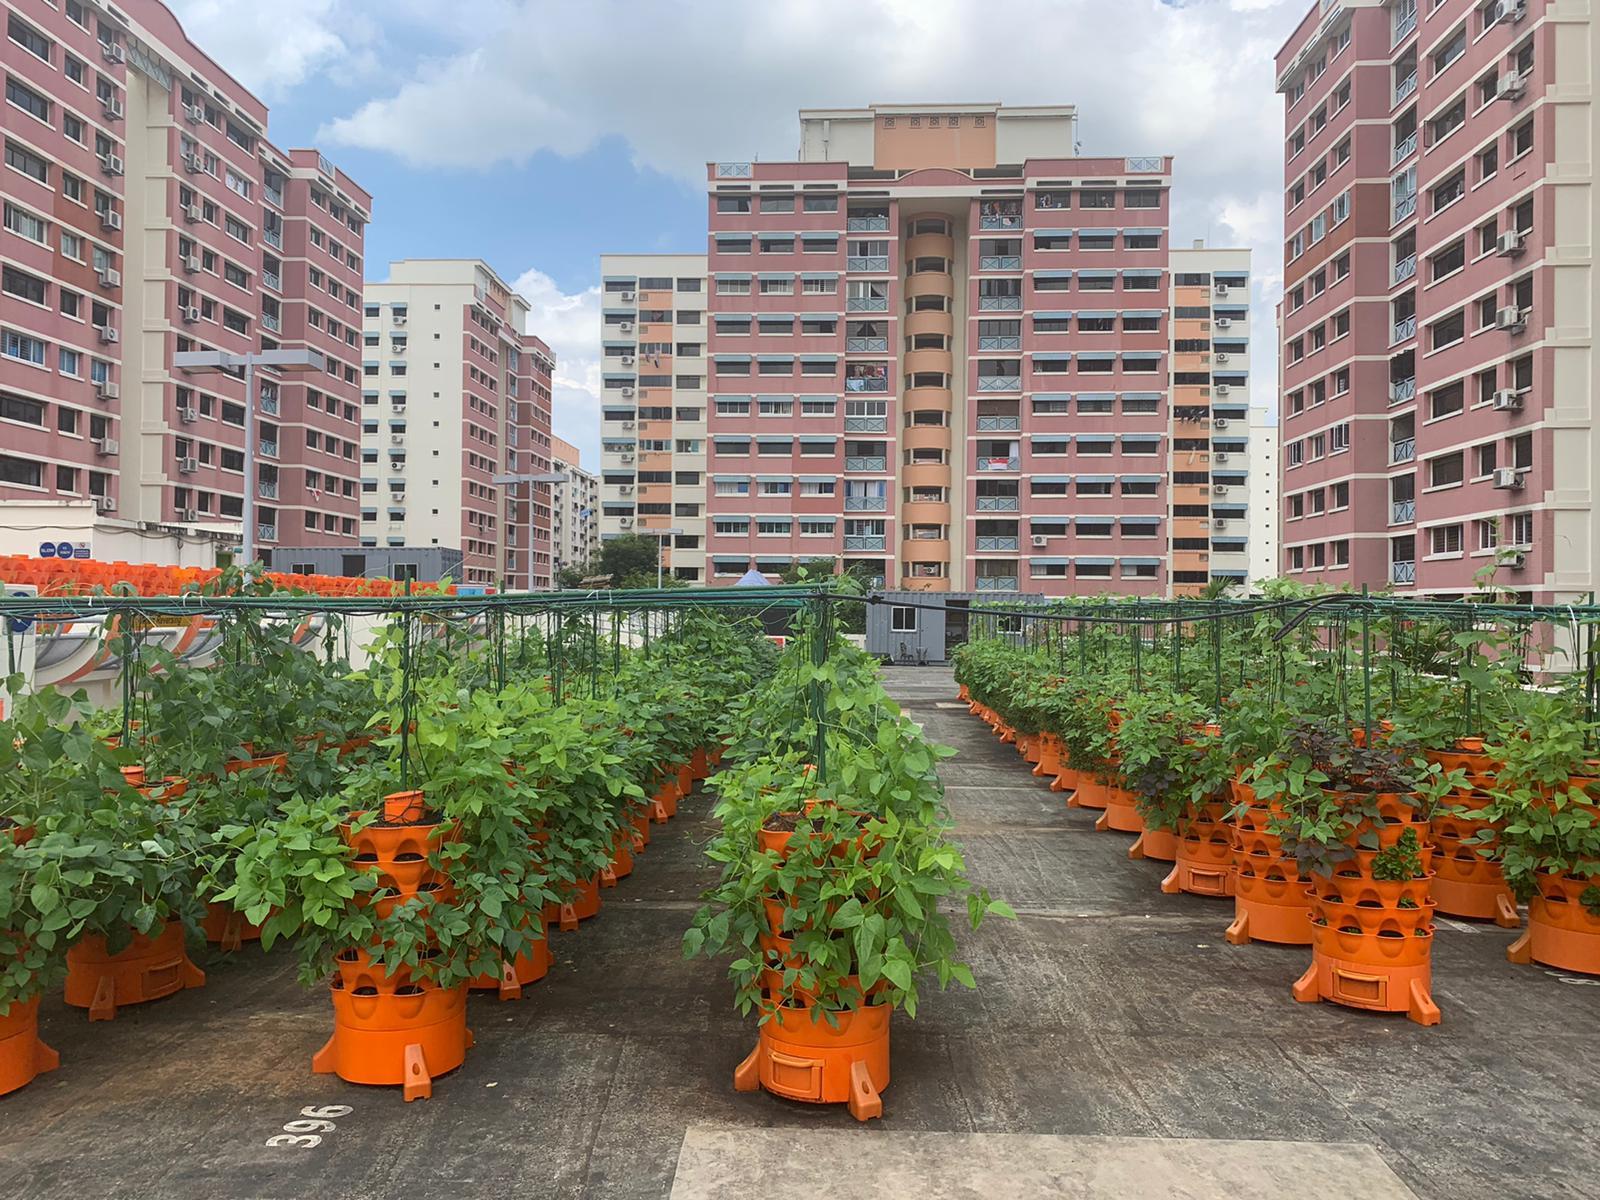 Smart Farm Collaboration (Soil based)